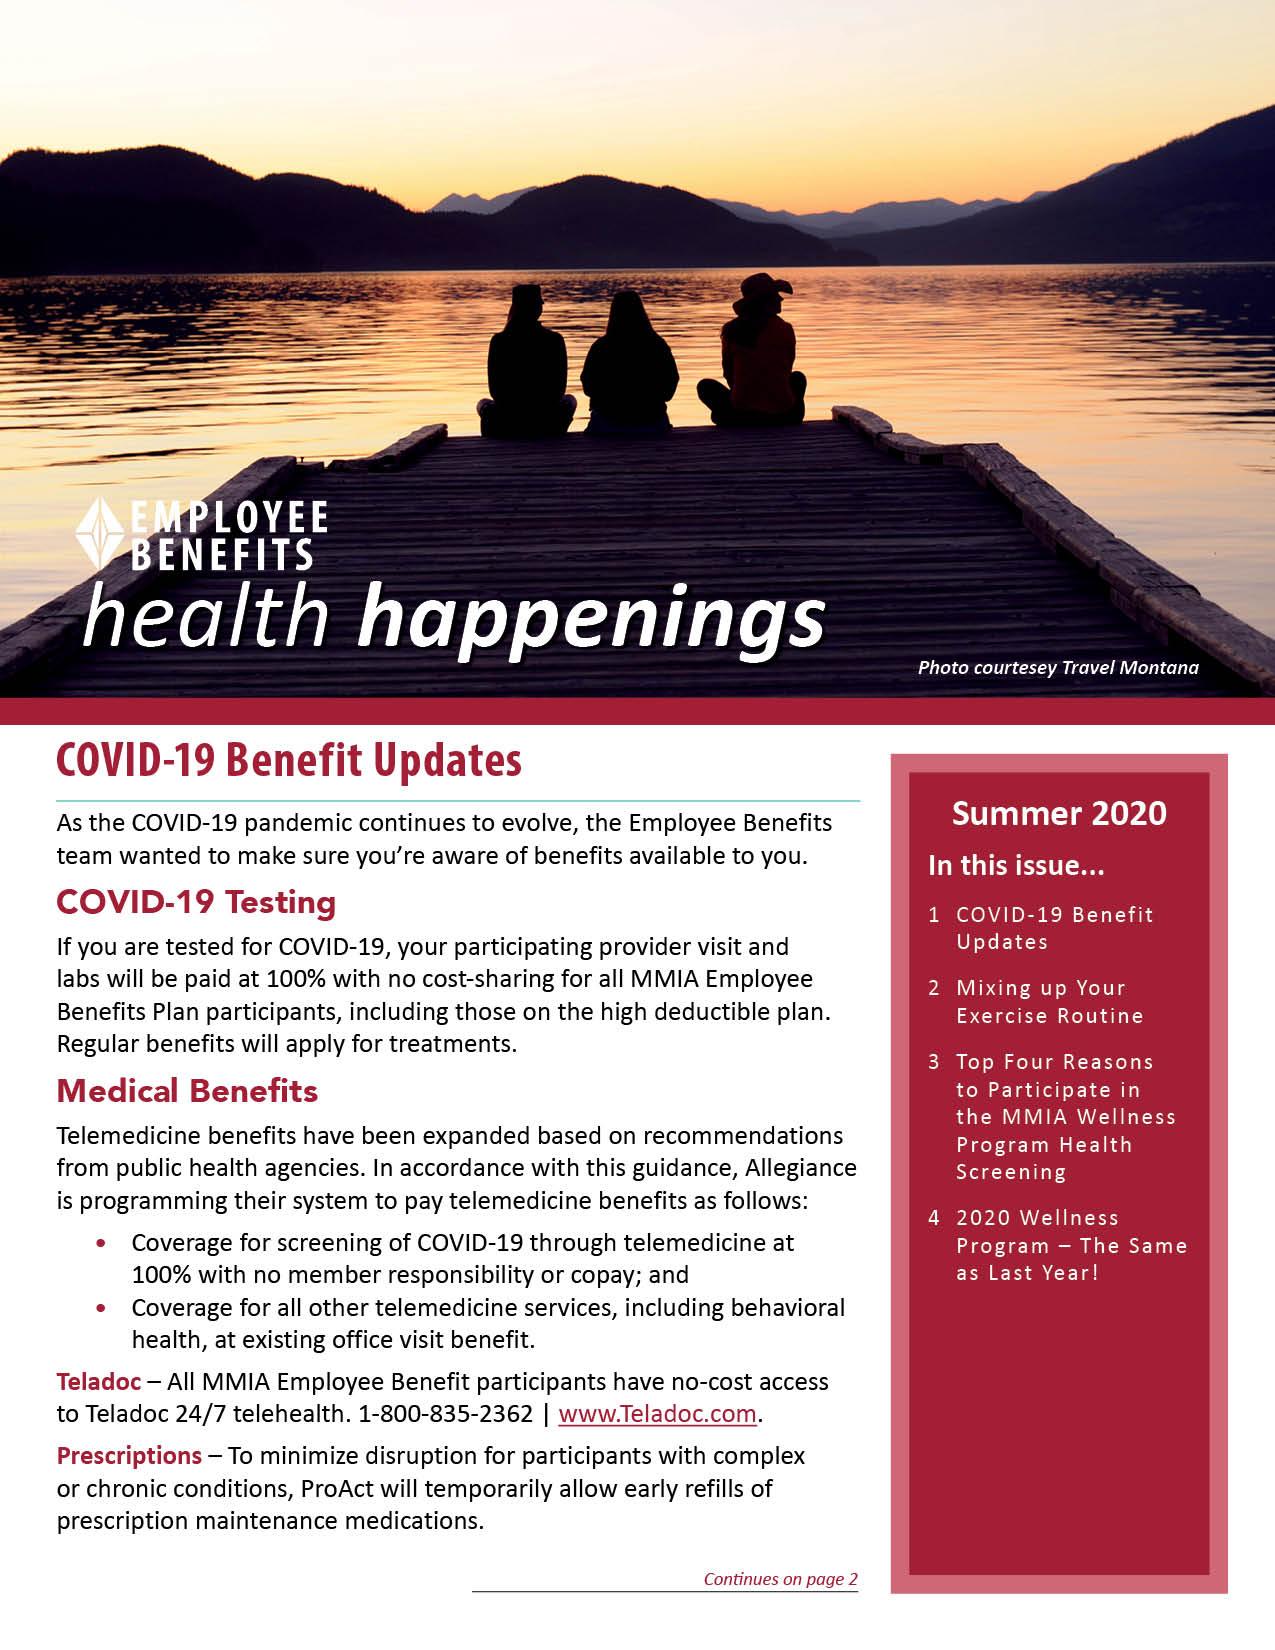 Employee Benefits Health Happenings Summer 2020 Newsletter